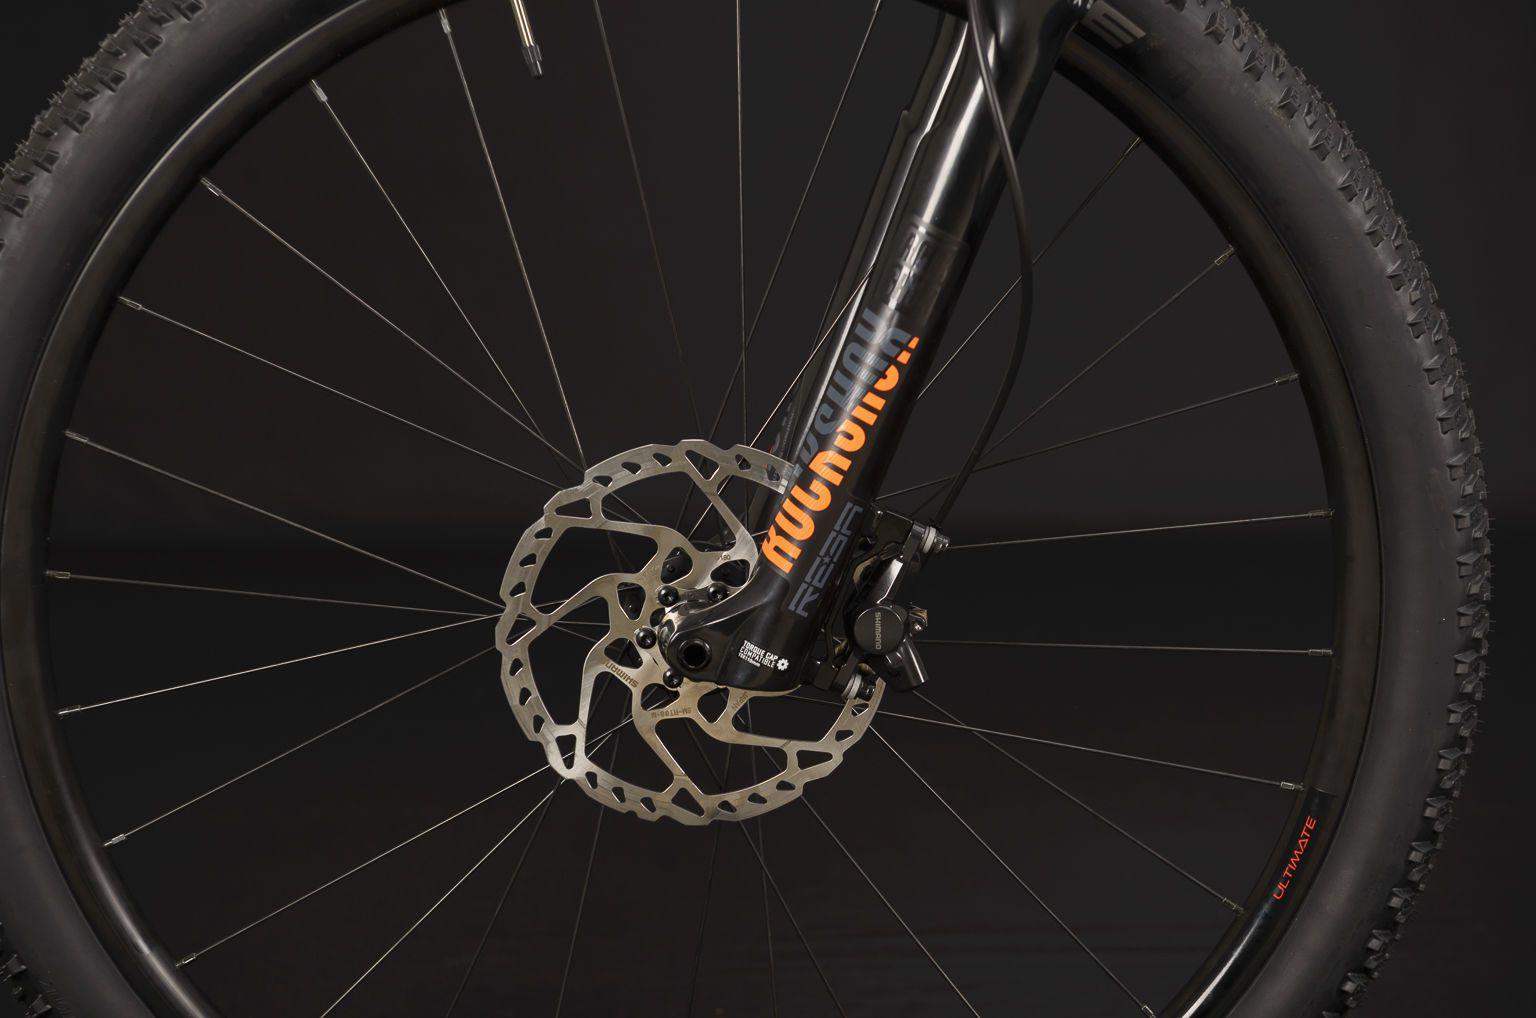 Bicicleta SENSE Impact Carbon Comp 2020 - Laranja/Acqua